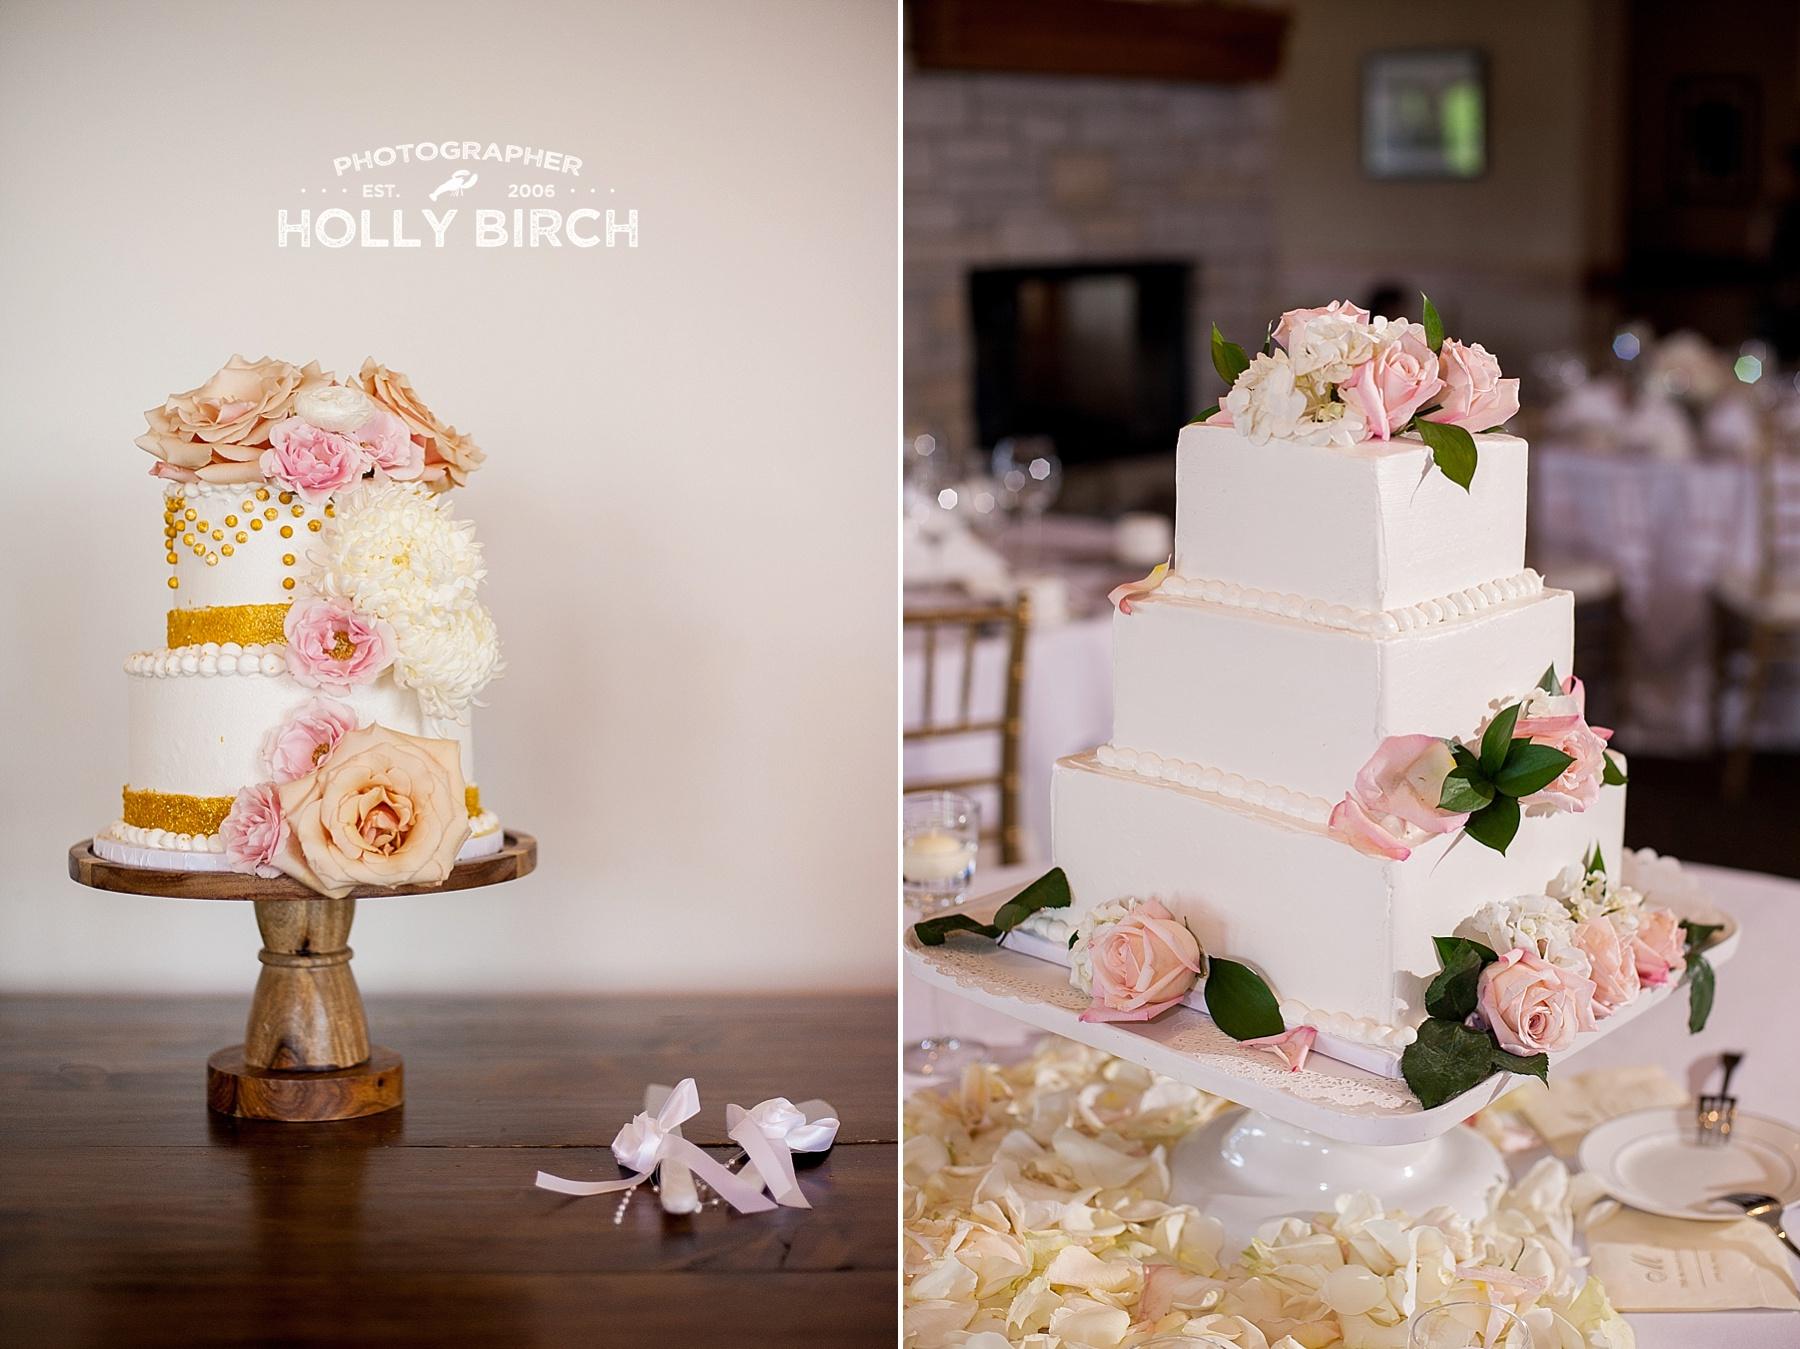 Champaign-Urbana wedding cakes